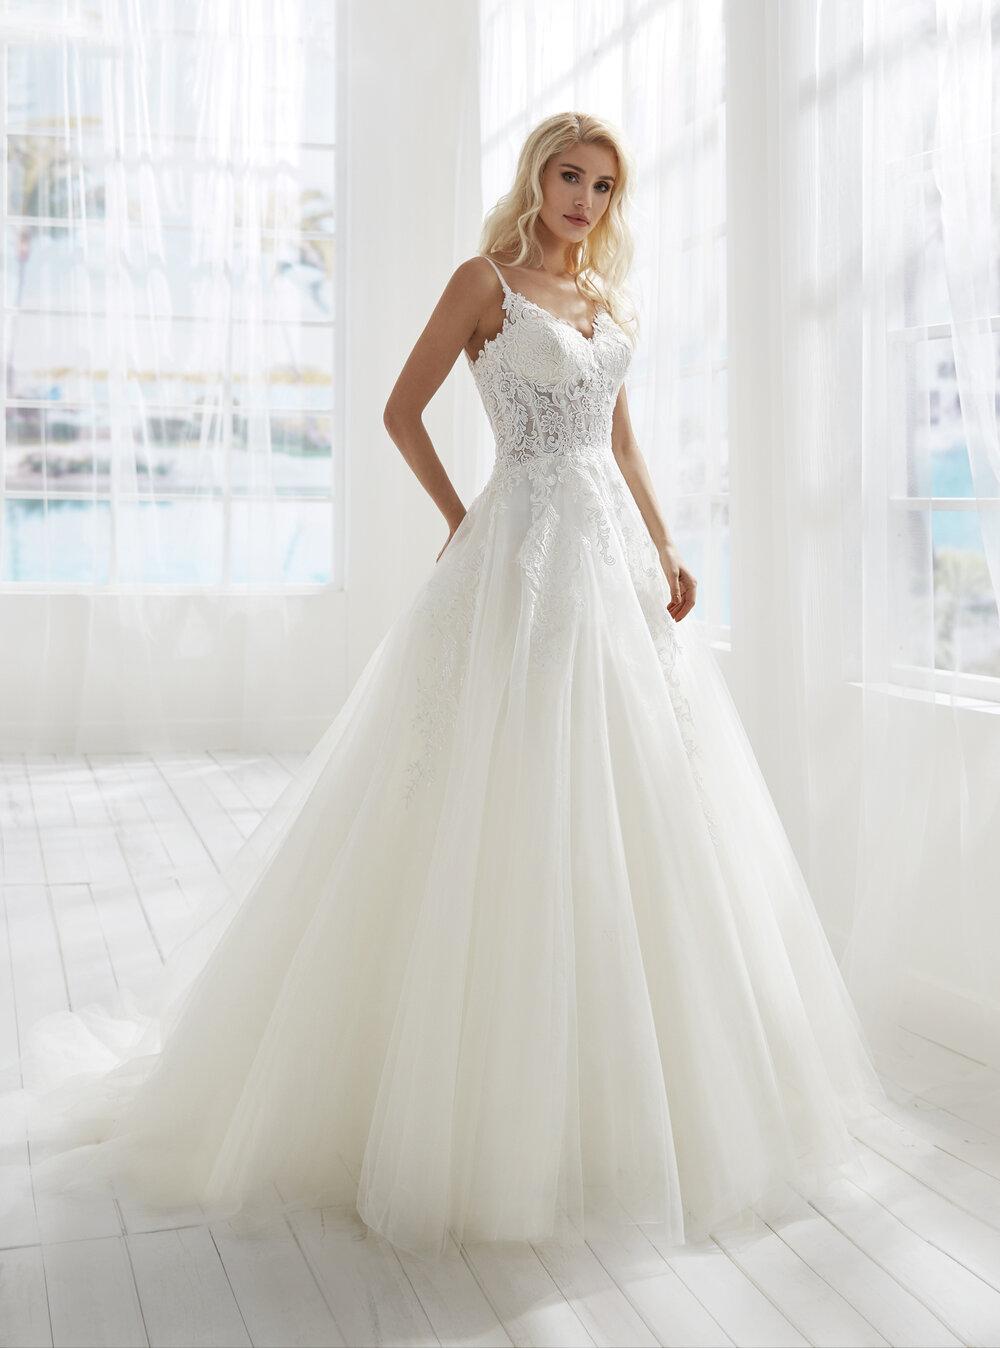 Verona Couture Bridal Boutique